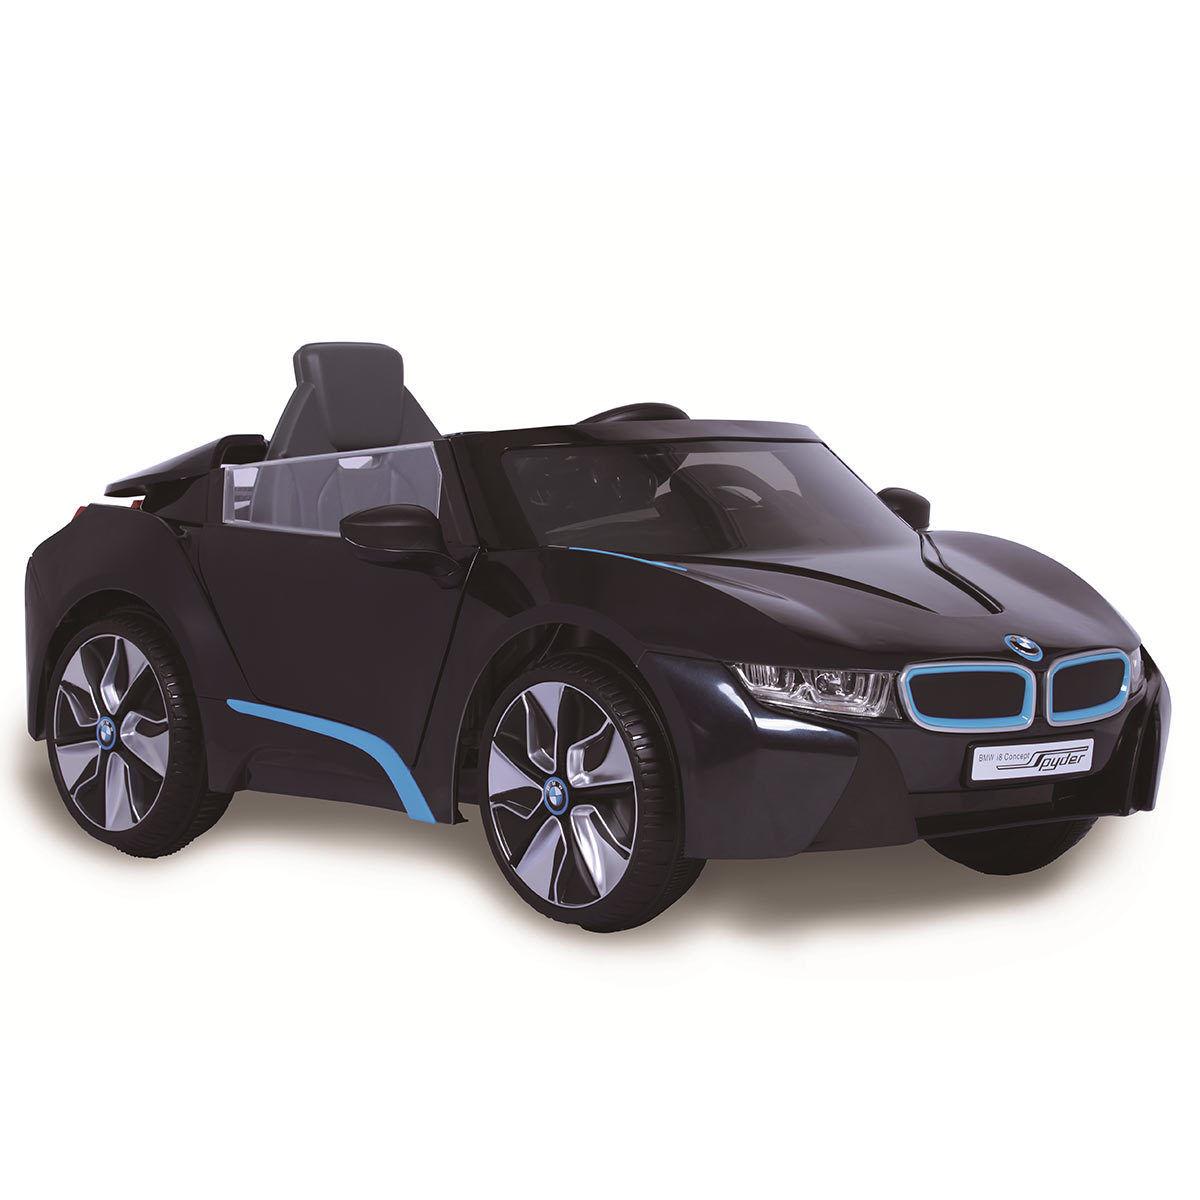 Rollplay Bmw I8 Spyder 12v Children S Kids Electric Ride On Car 3